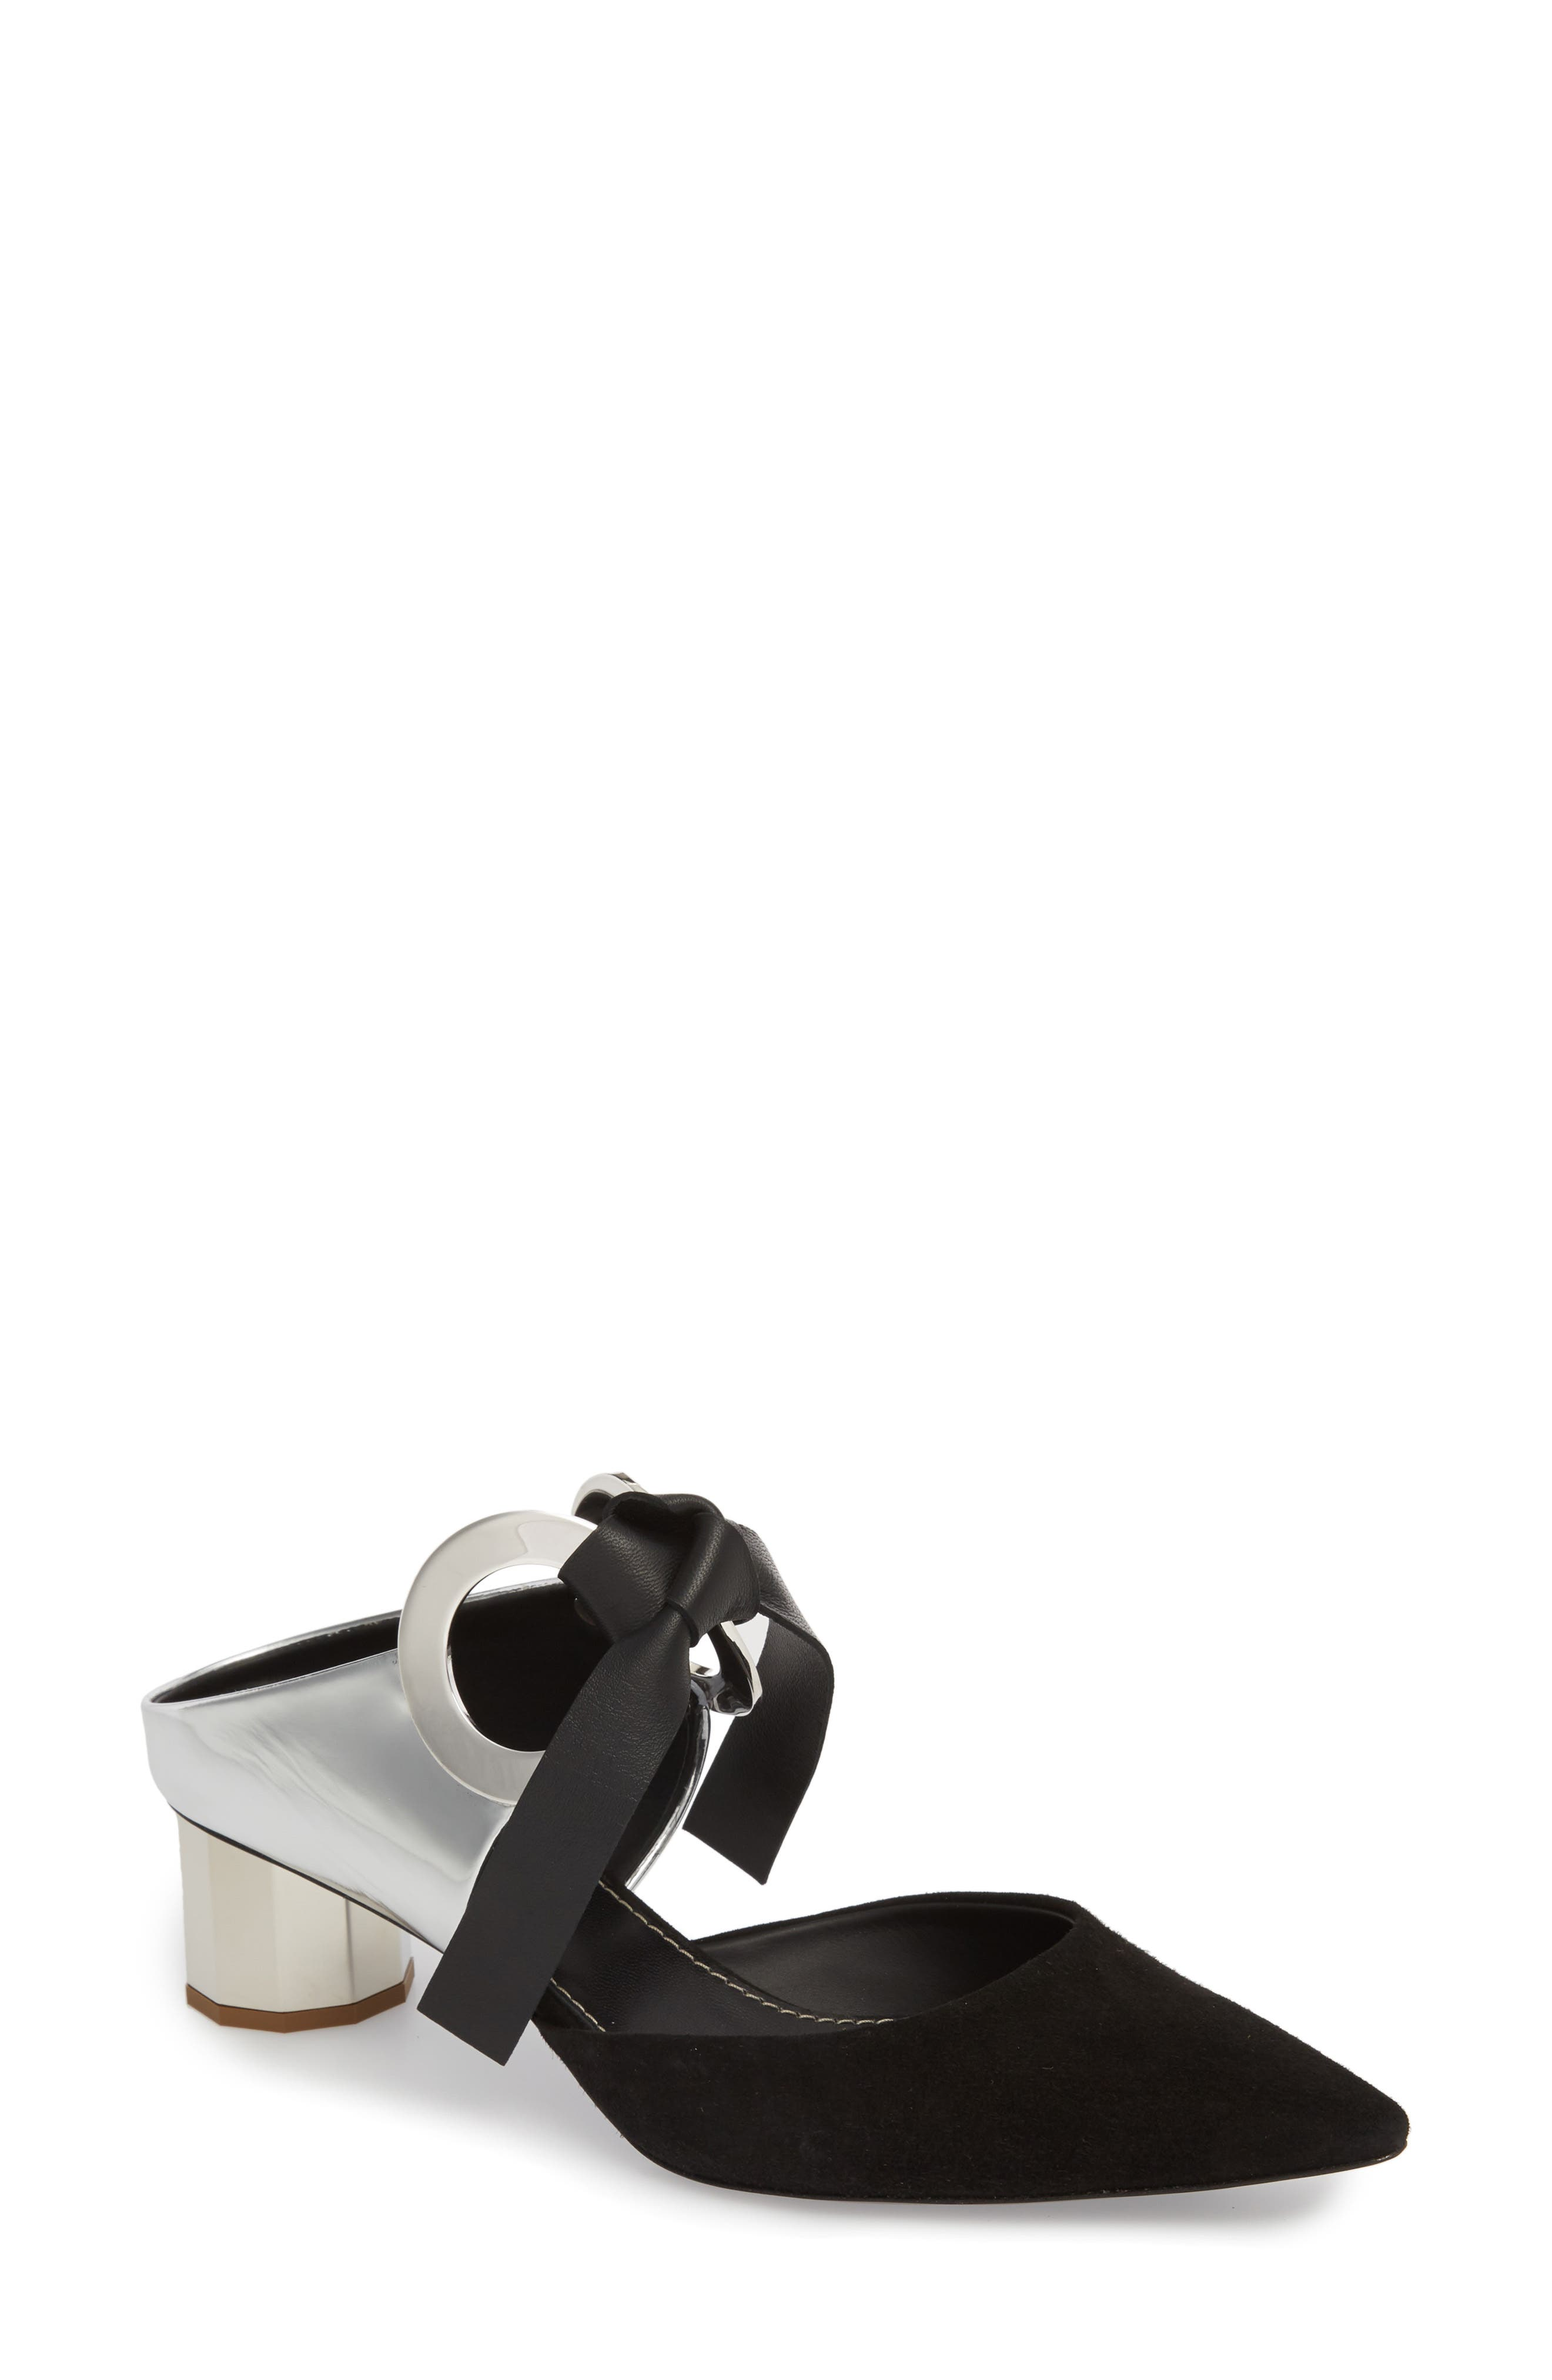 PROENZA SCHOULER Grommet Pointy Toe Mule, Main, color, SILVER/ BLACK